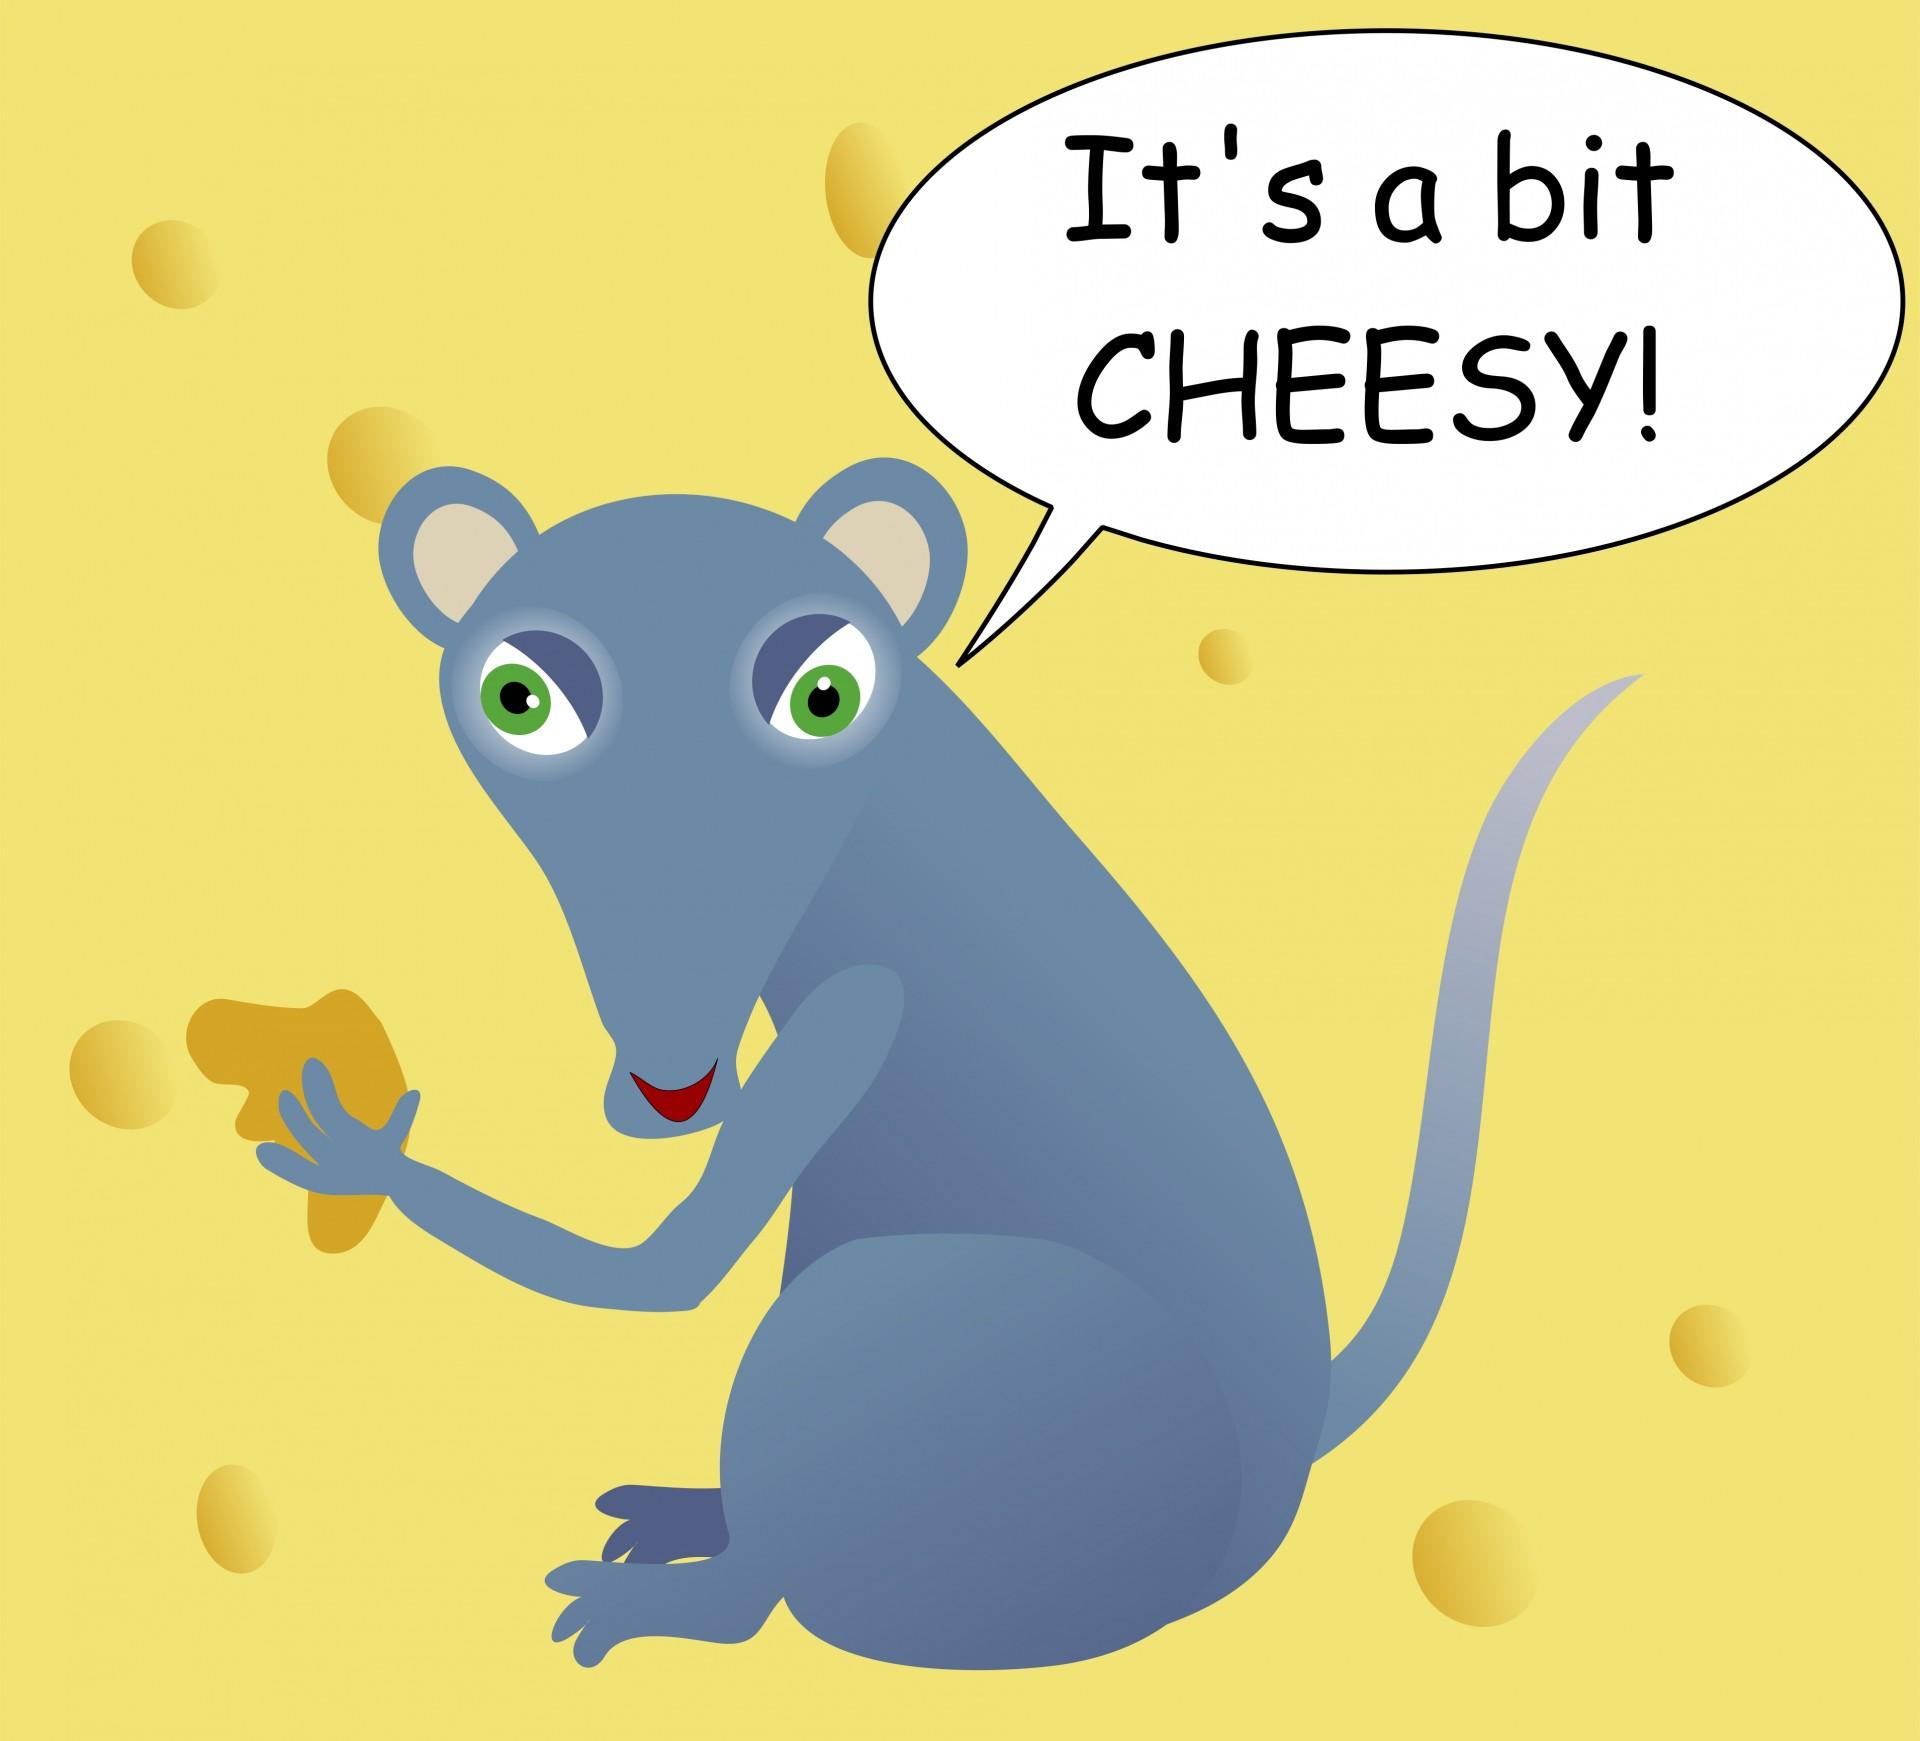 Cheesy mouse photo